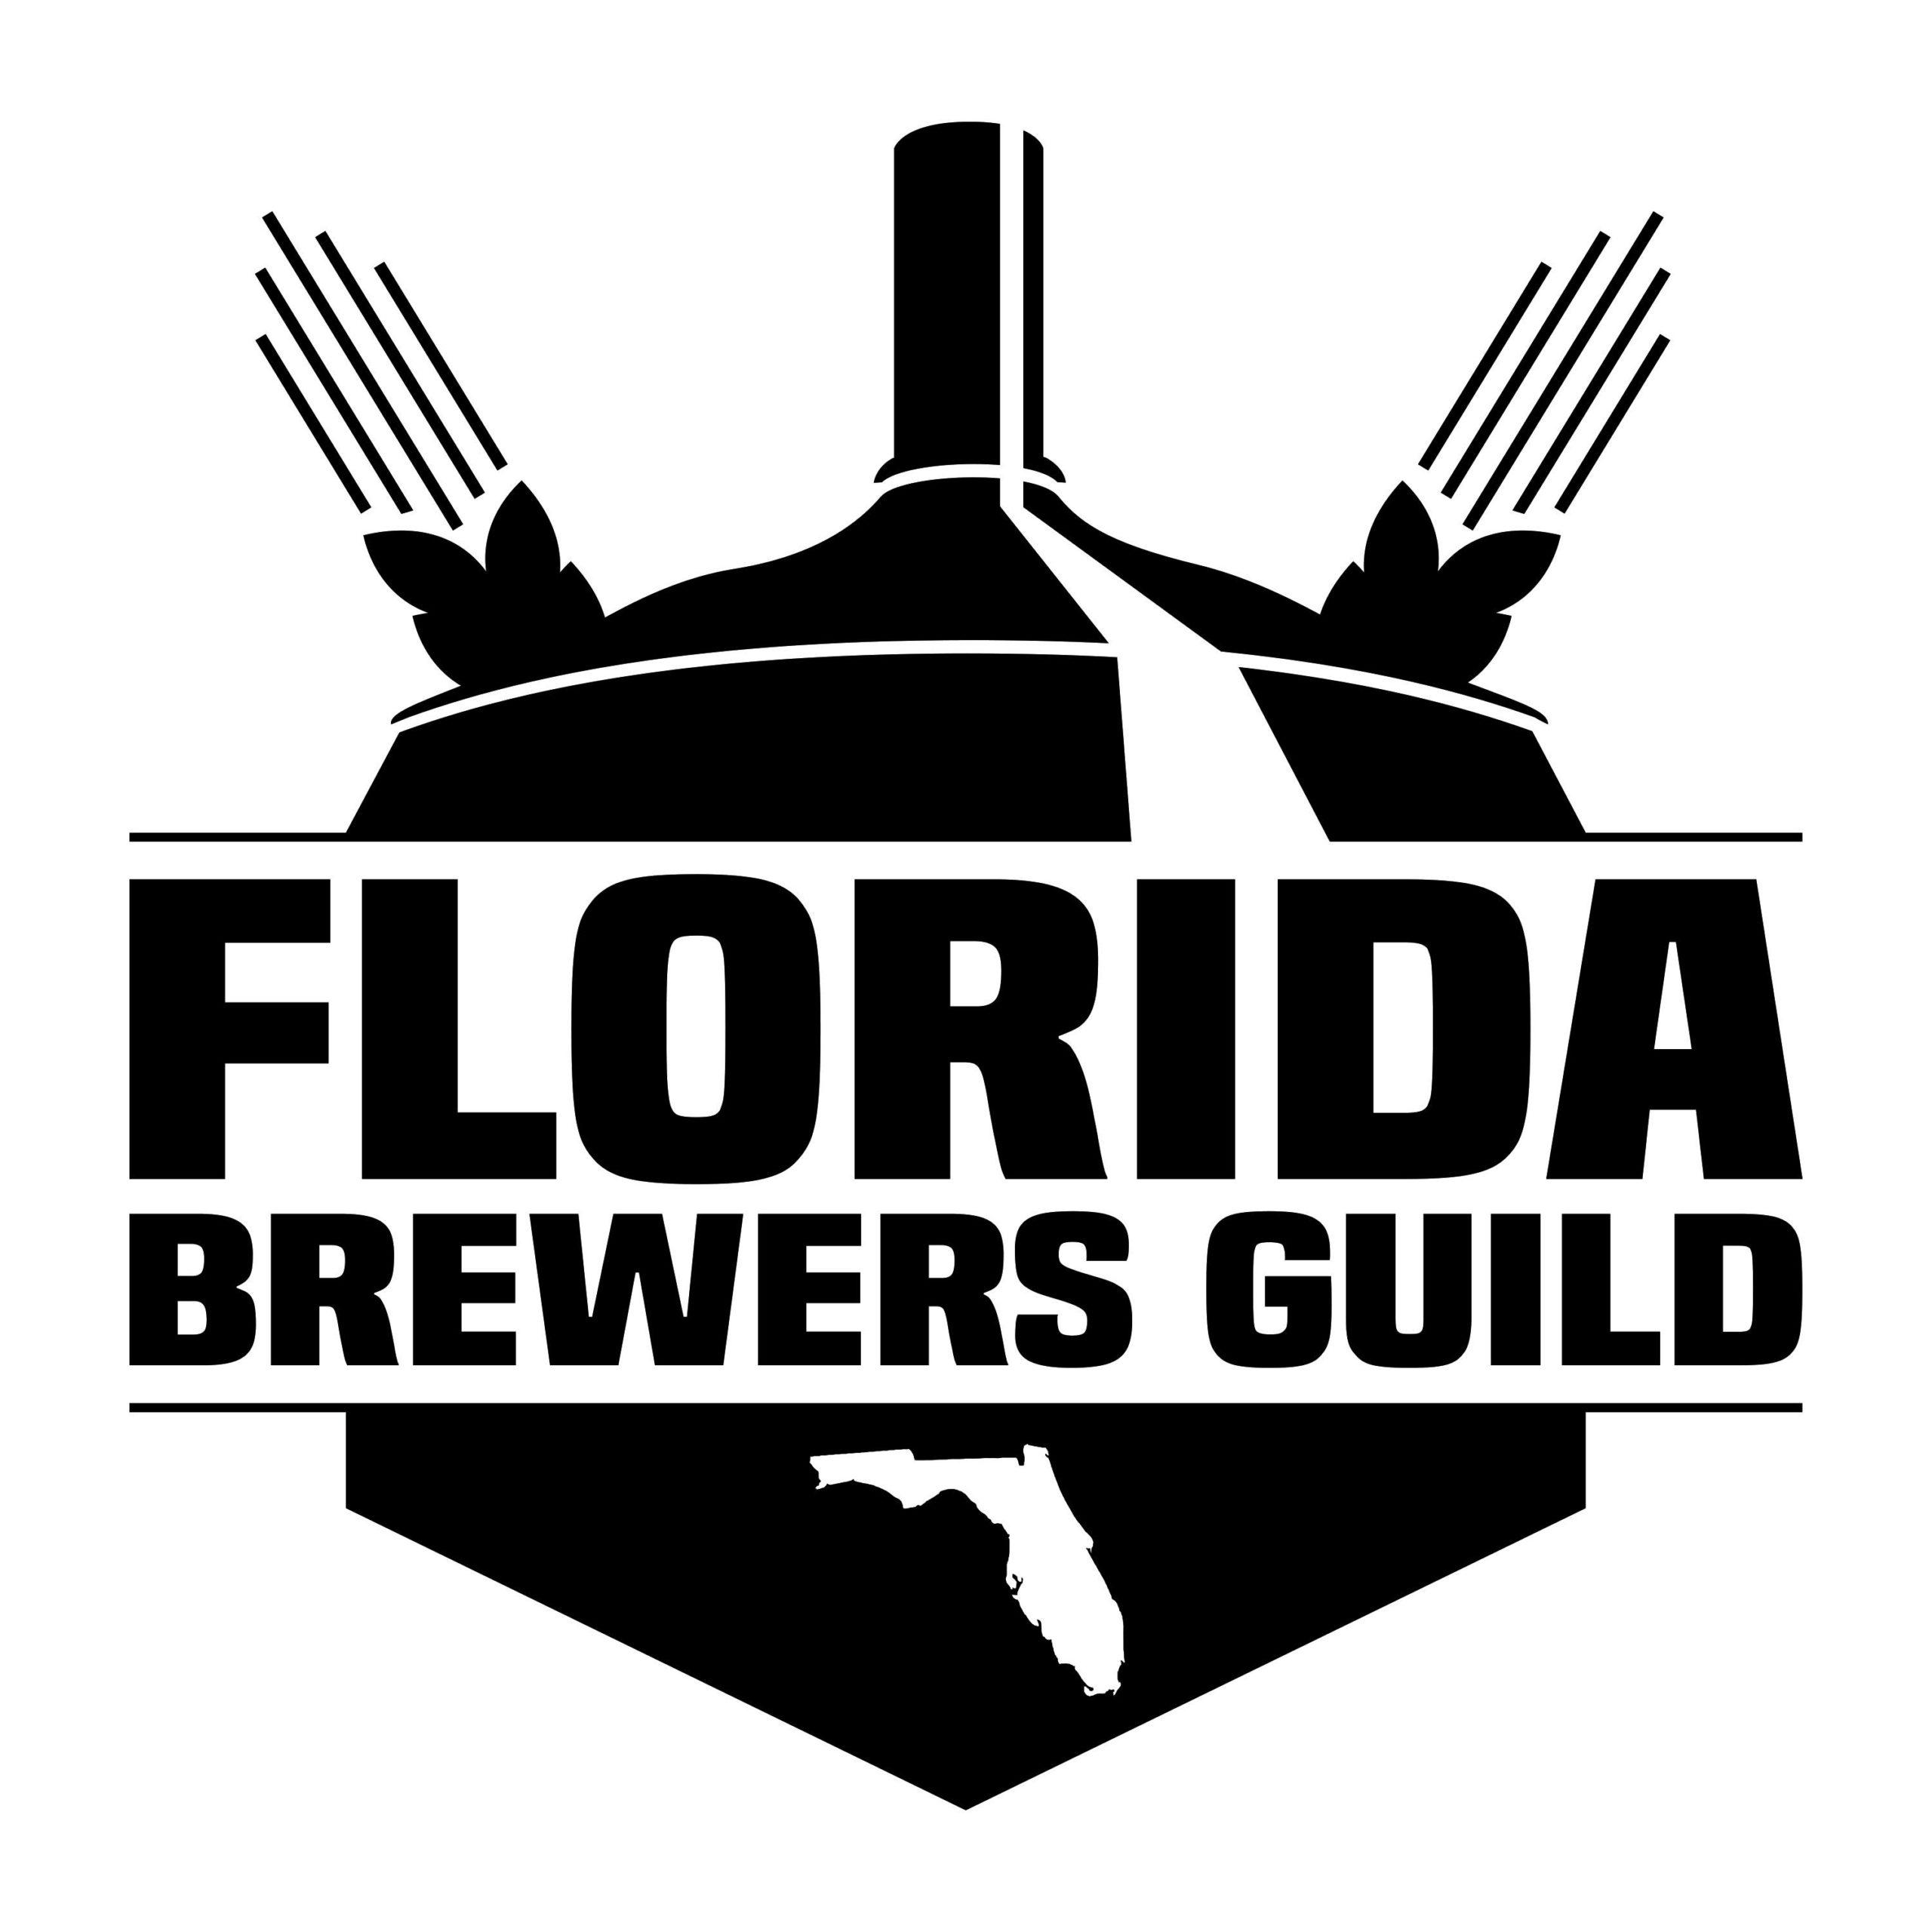 Florida Brewers Guild logo